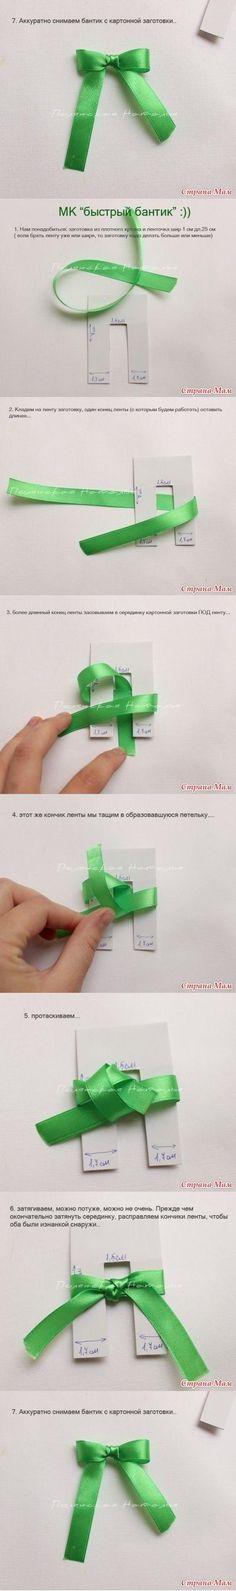 DIY Easy Ribbon Bow